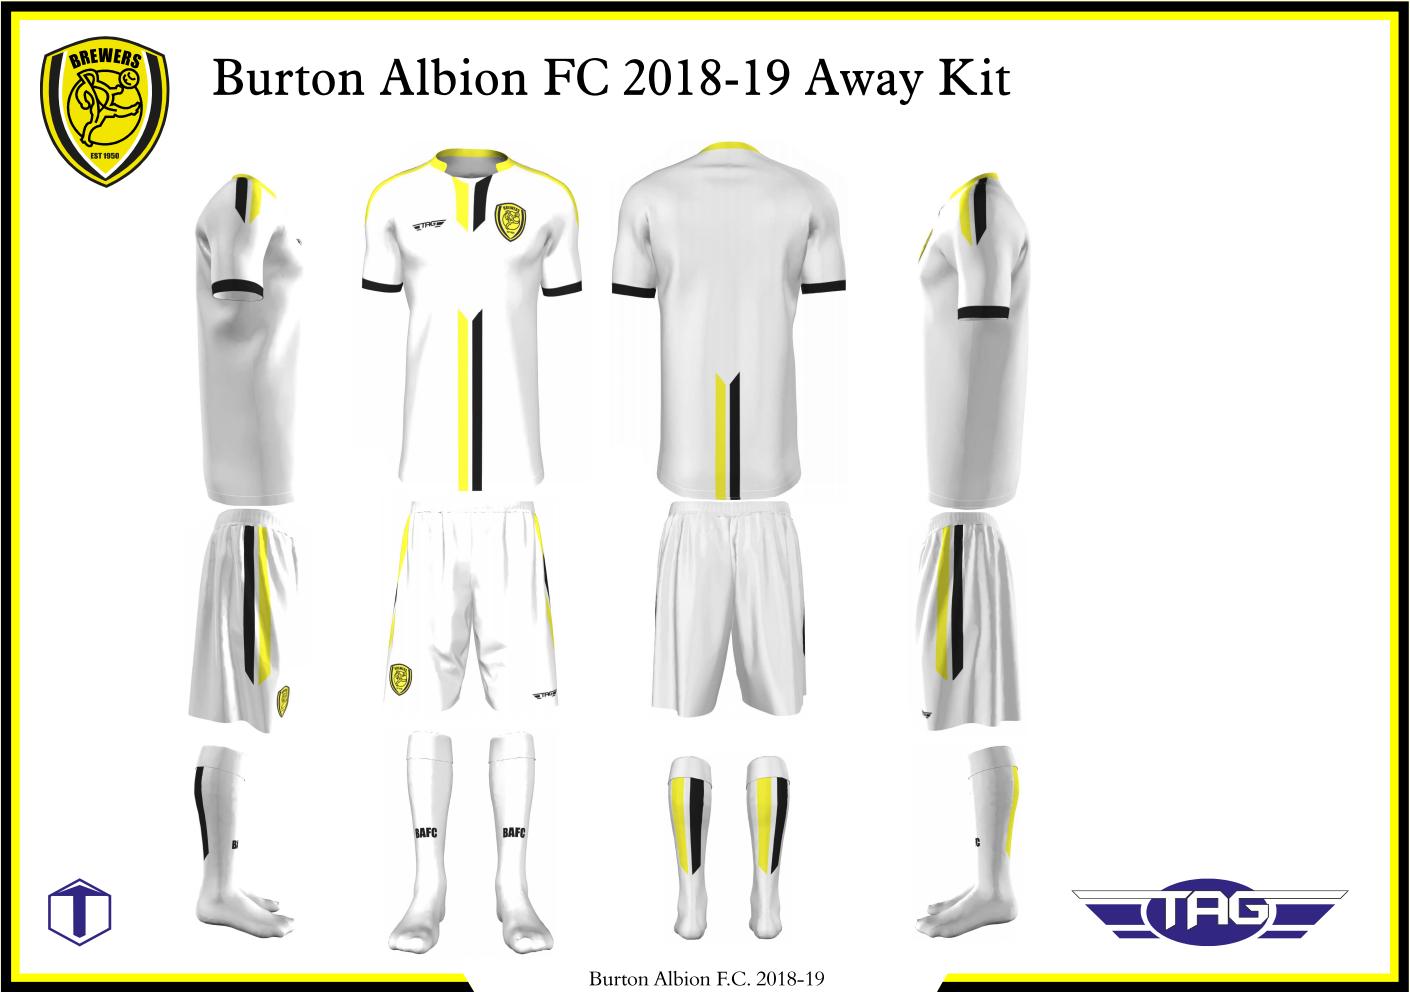 2018/19 KIT REVEALED - News - Burton Albion